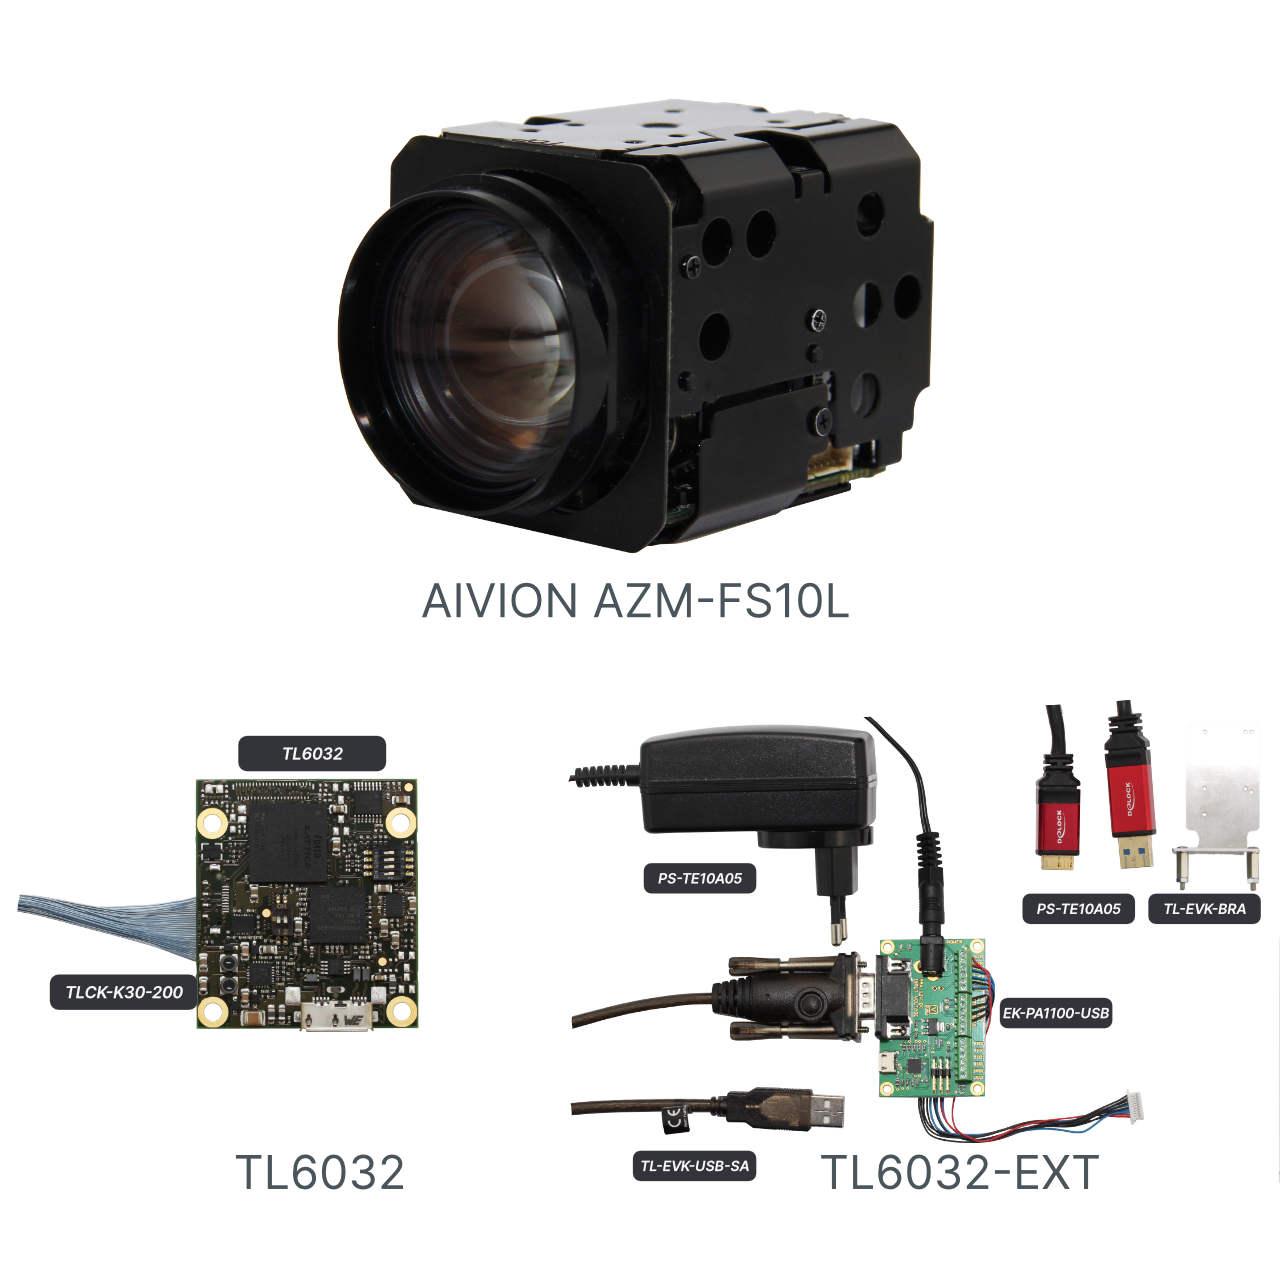 TL6032 |USB 3.0, Horiziontal Micro B Connector